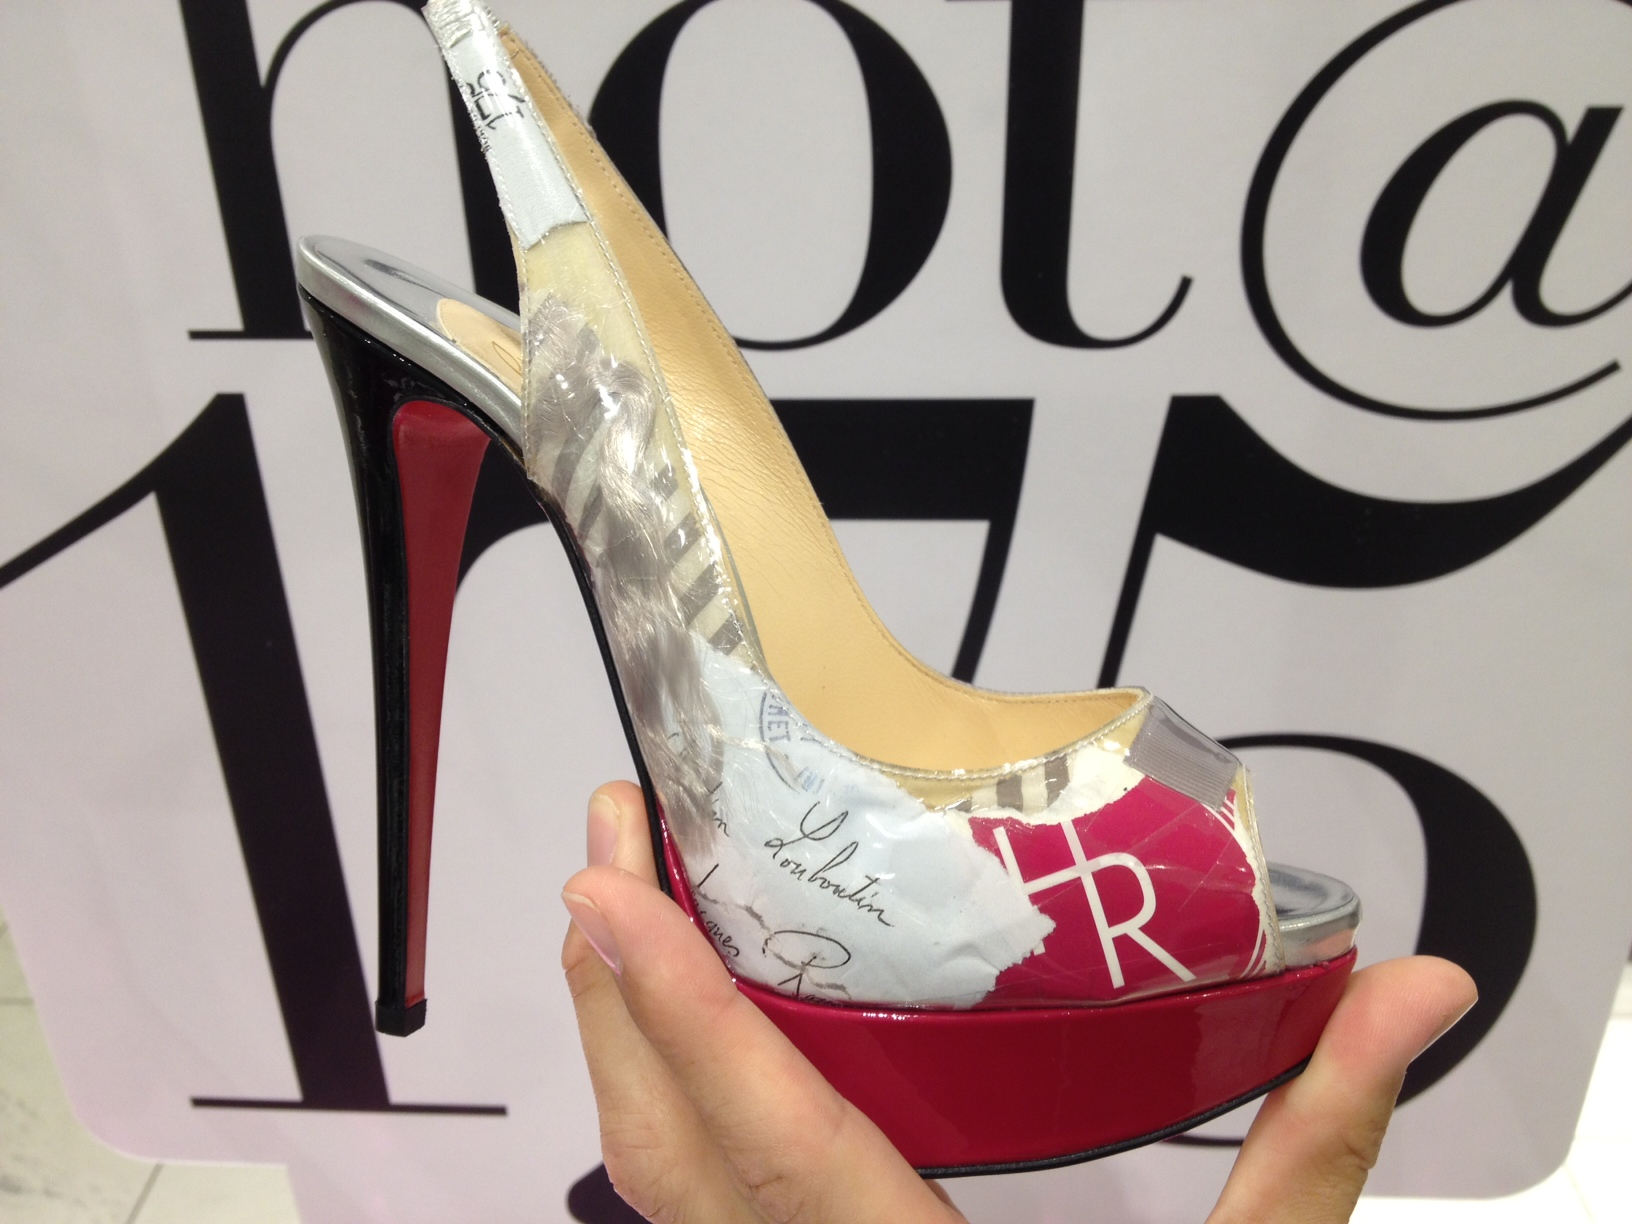 christian louboutin shoes at holt renfrew